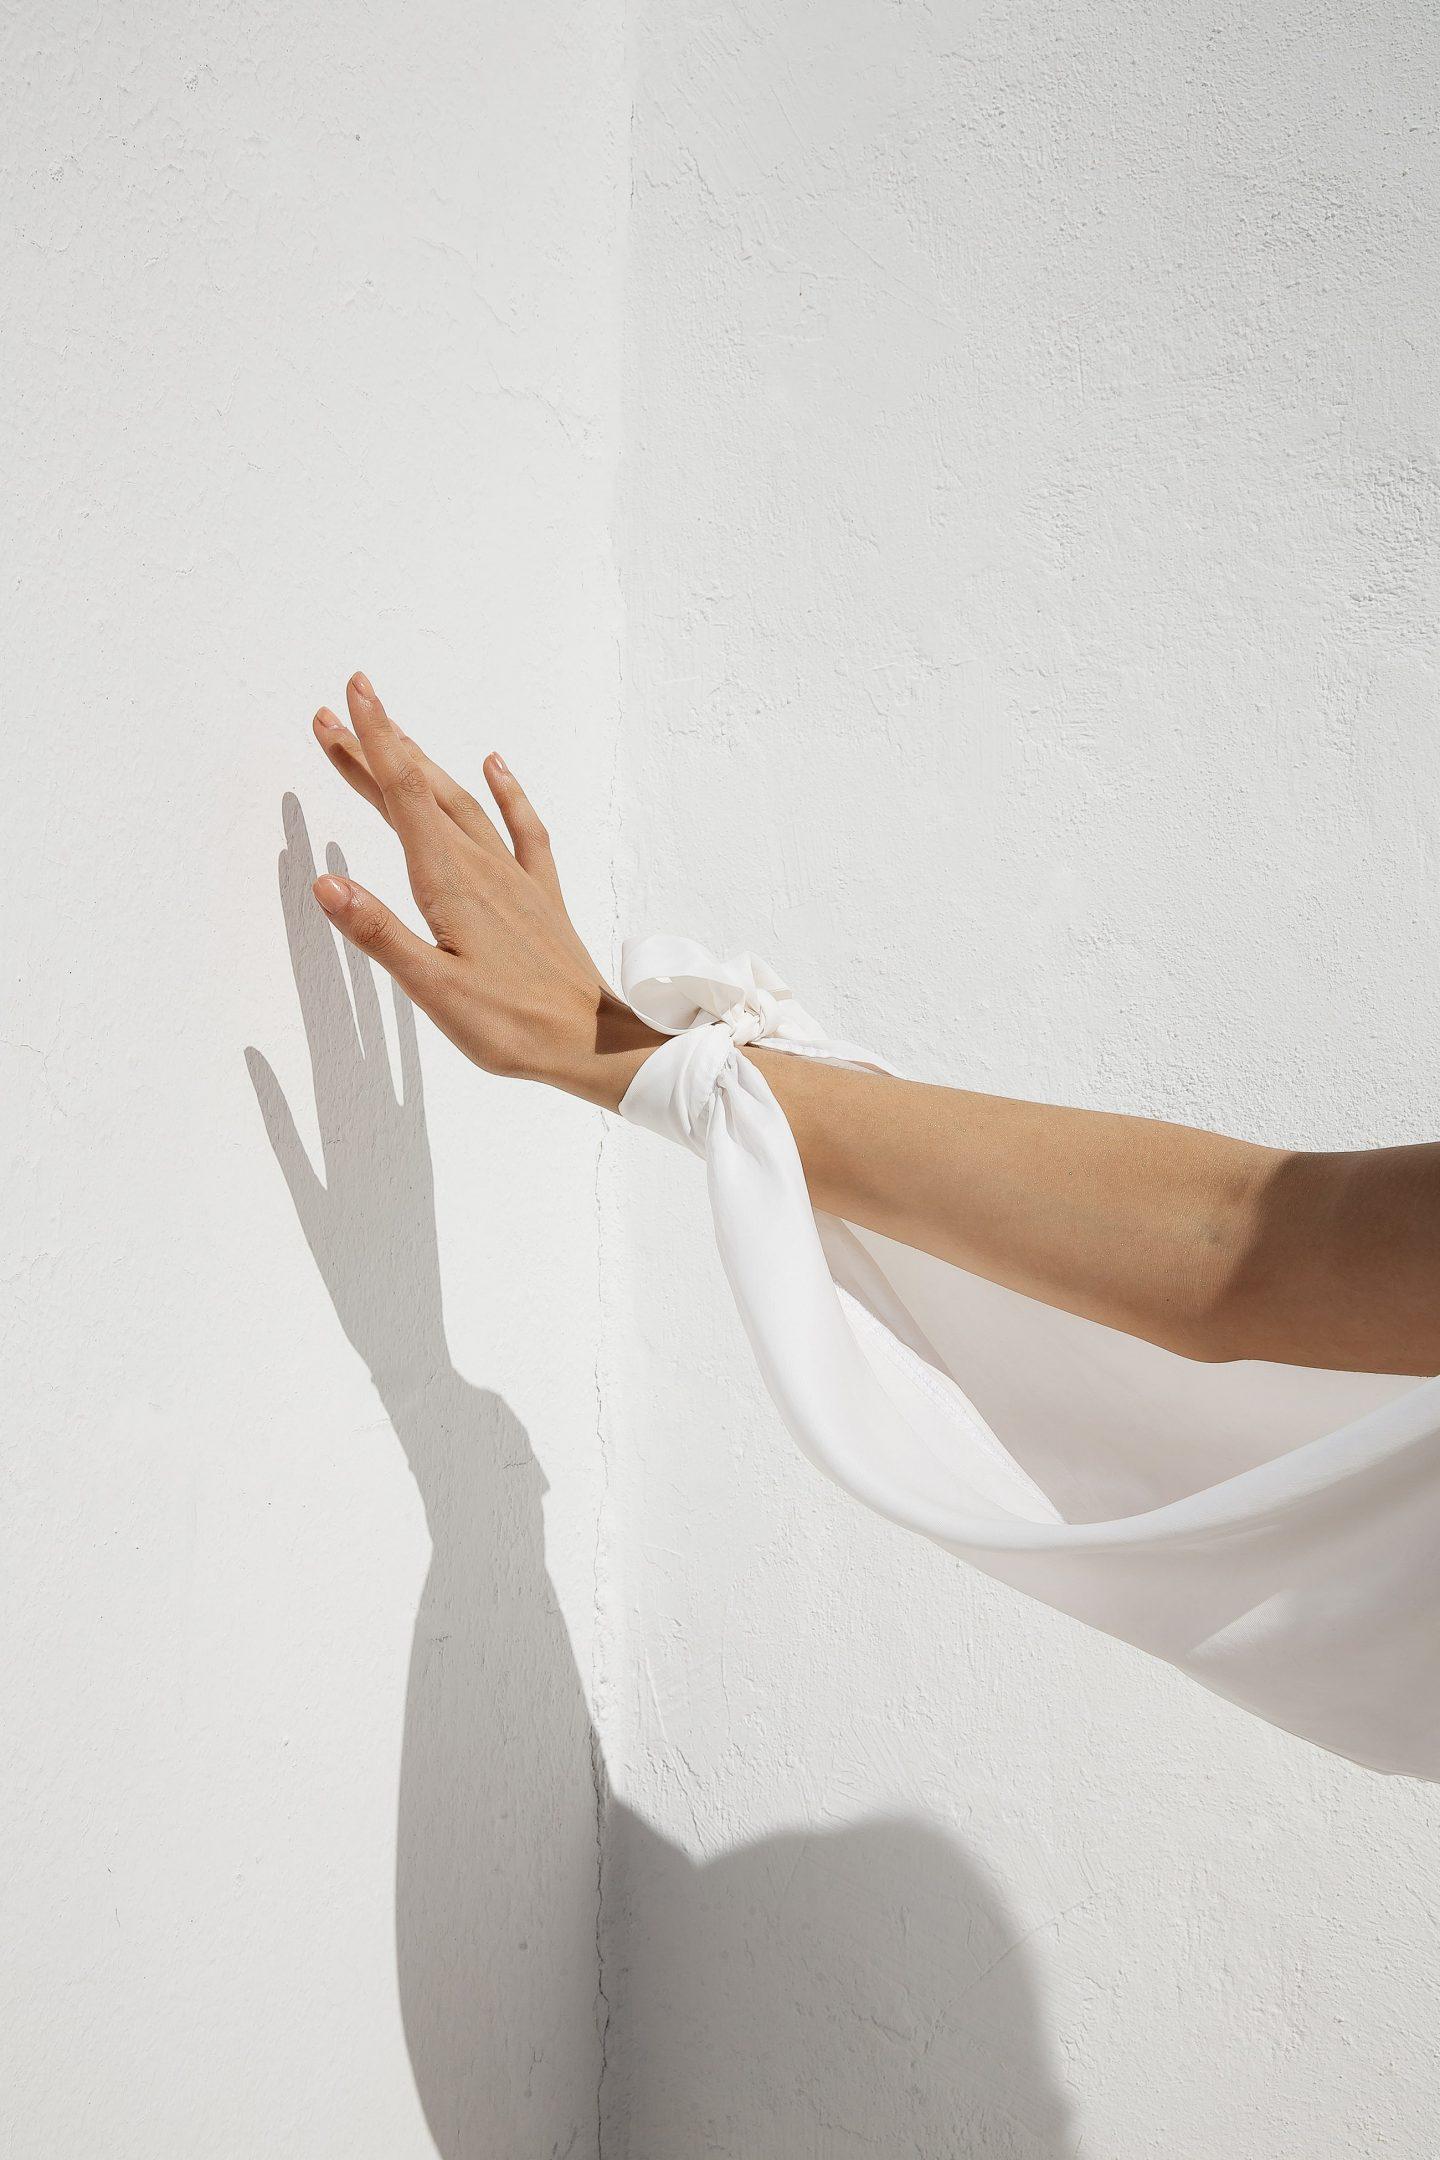 IGNANT-Photography-MaraLazaridou-14